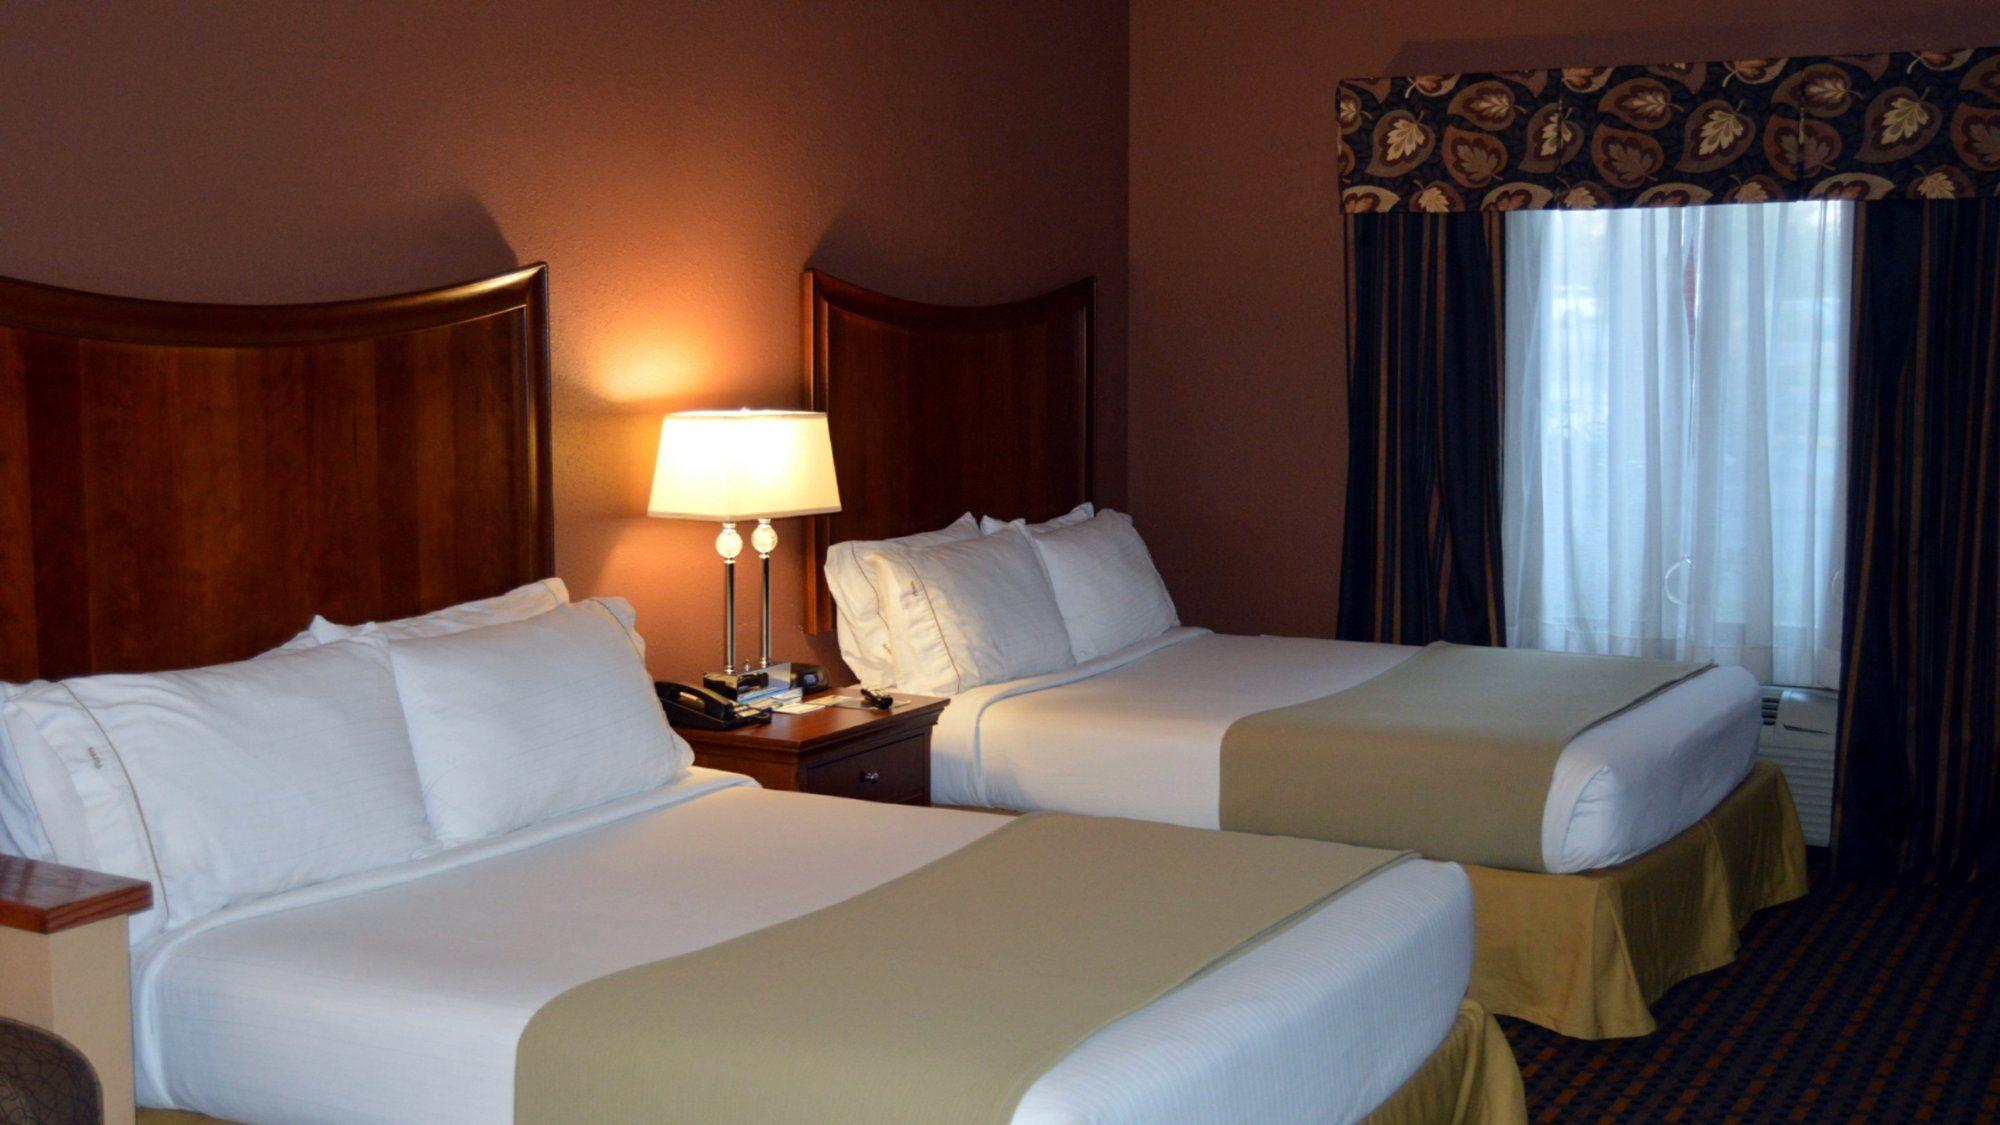 Holiday Inn Express Hotel & Suites Suffolk in Suffolk, VA